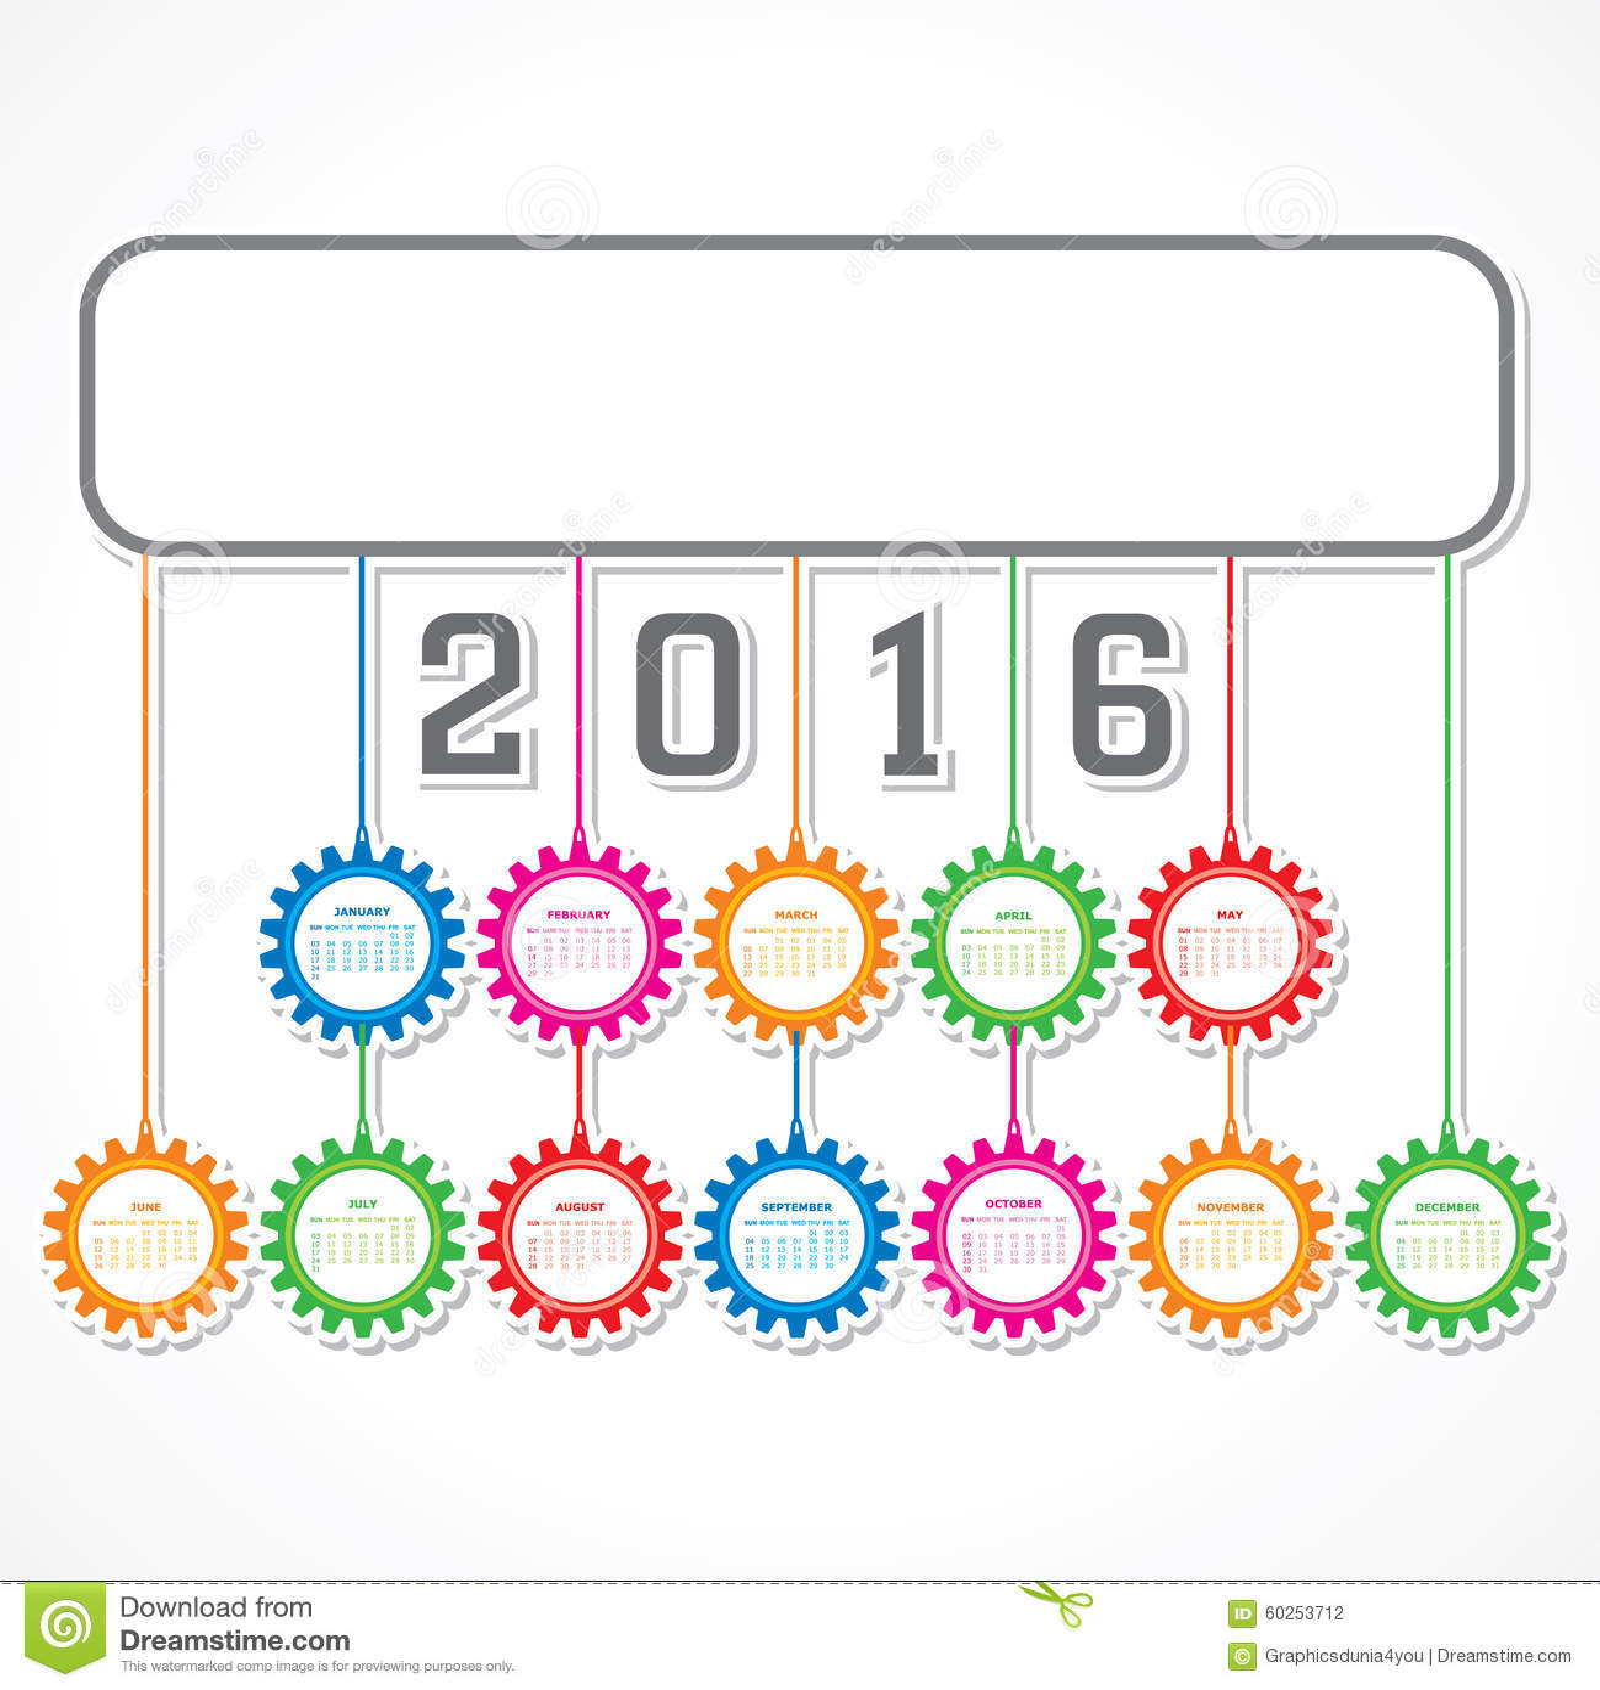 Calendar Design For New Year : Creative new year calendar design stock vector